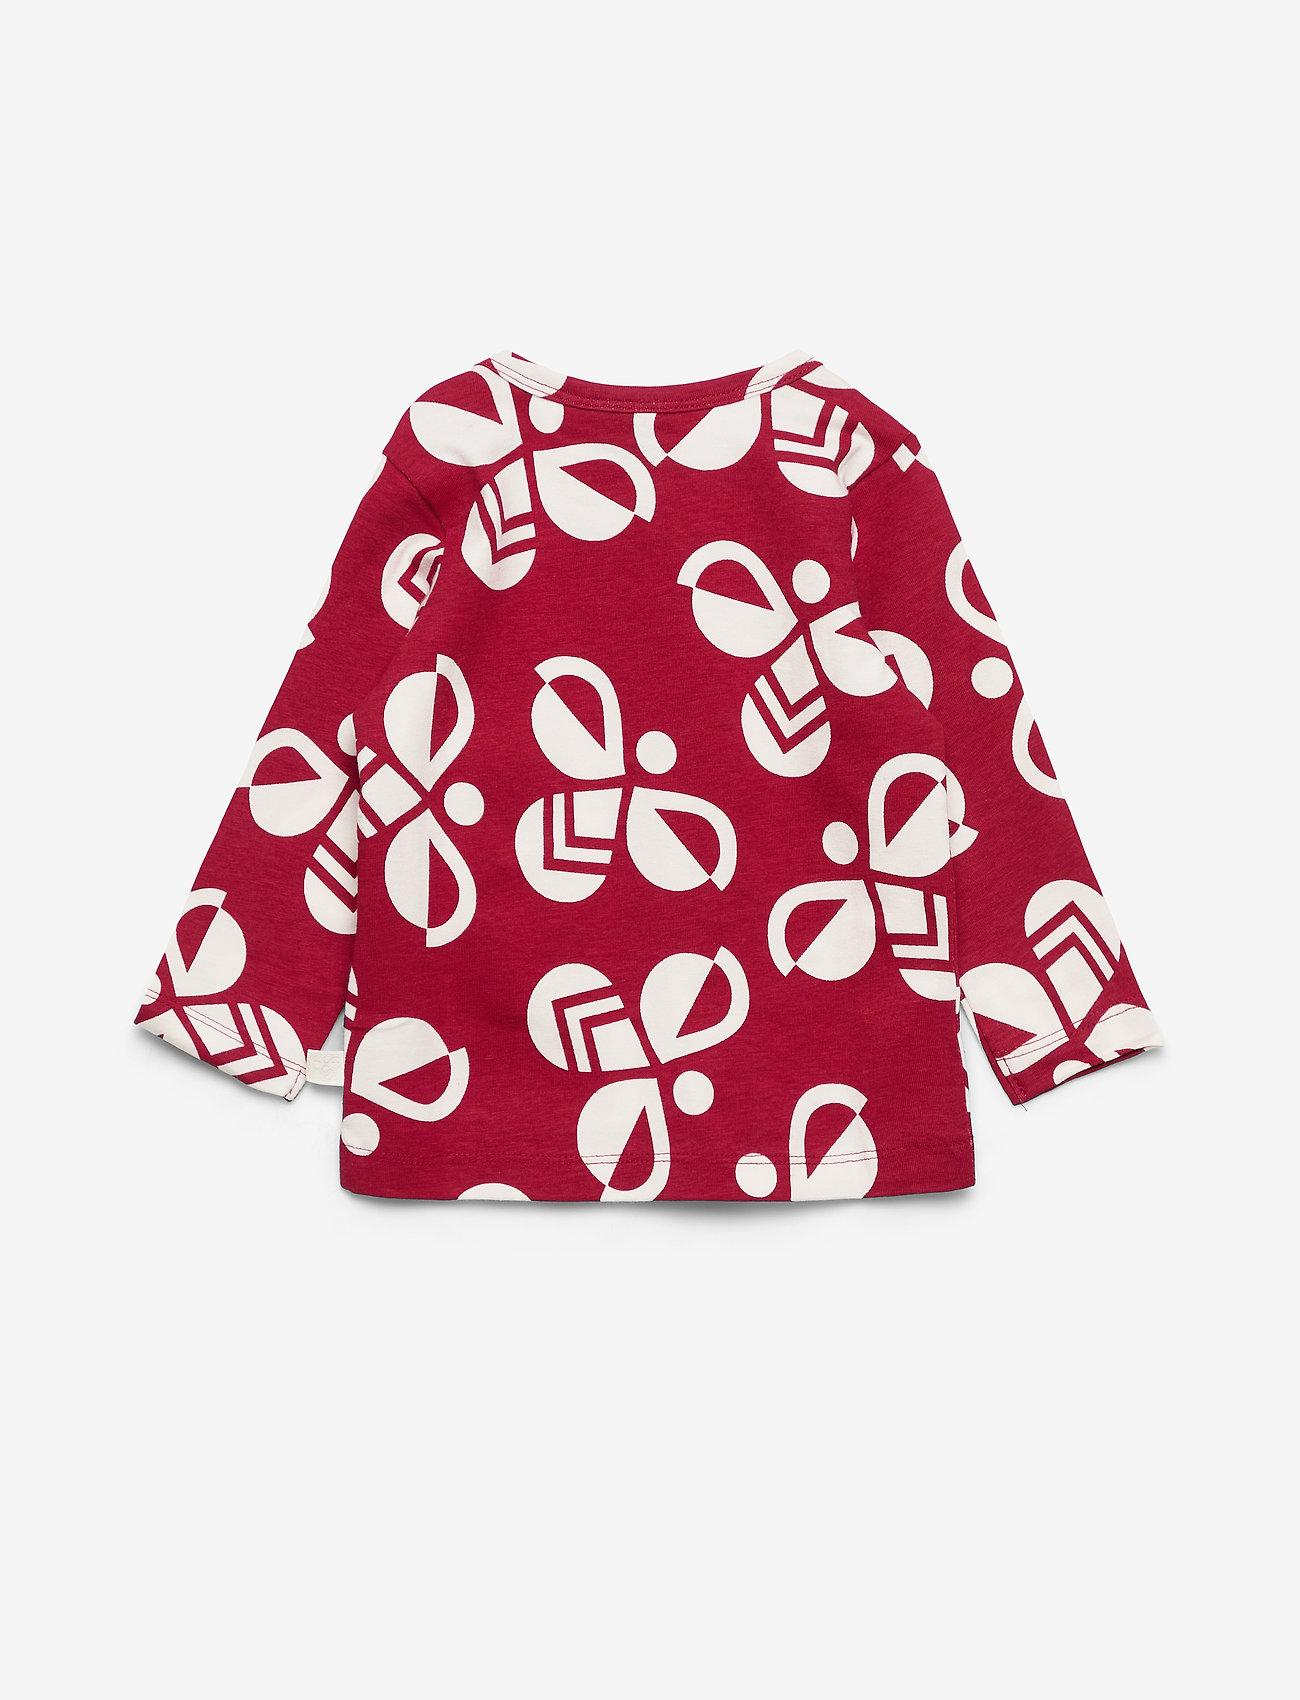 Hummel - hmlCHARLIE T-SHIRT L/S - long-sleeved t-shirts - rio red - 1